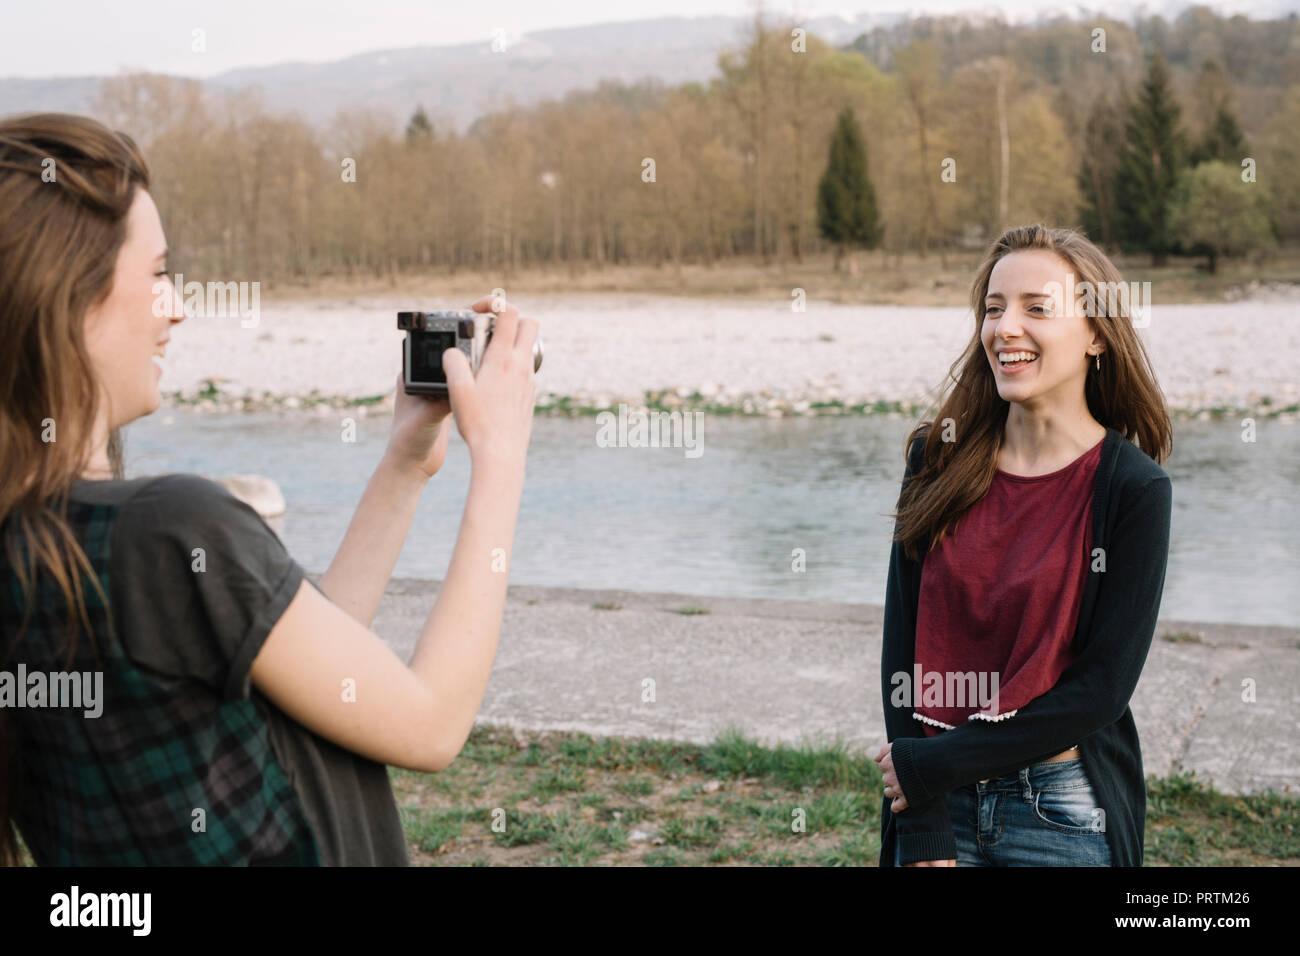 Girlfriends taking photograph by river, Belluno, Veneto, Italy - Stock Image